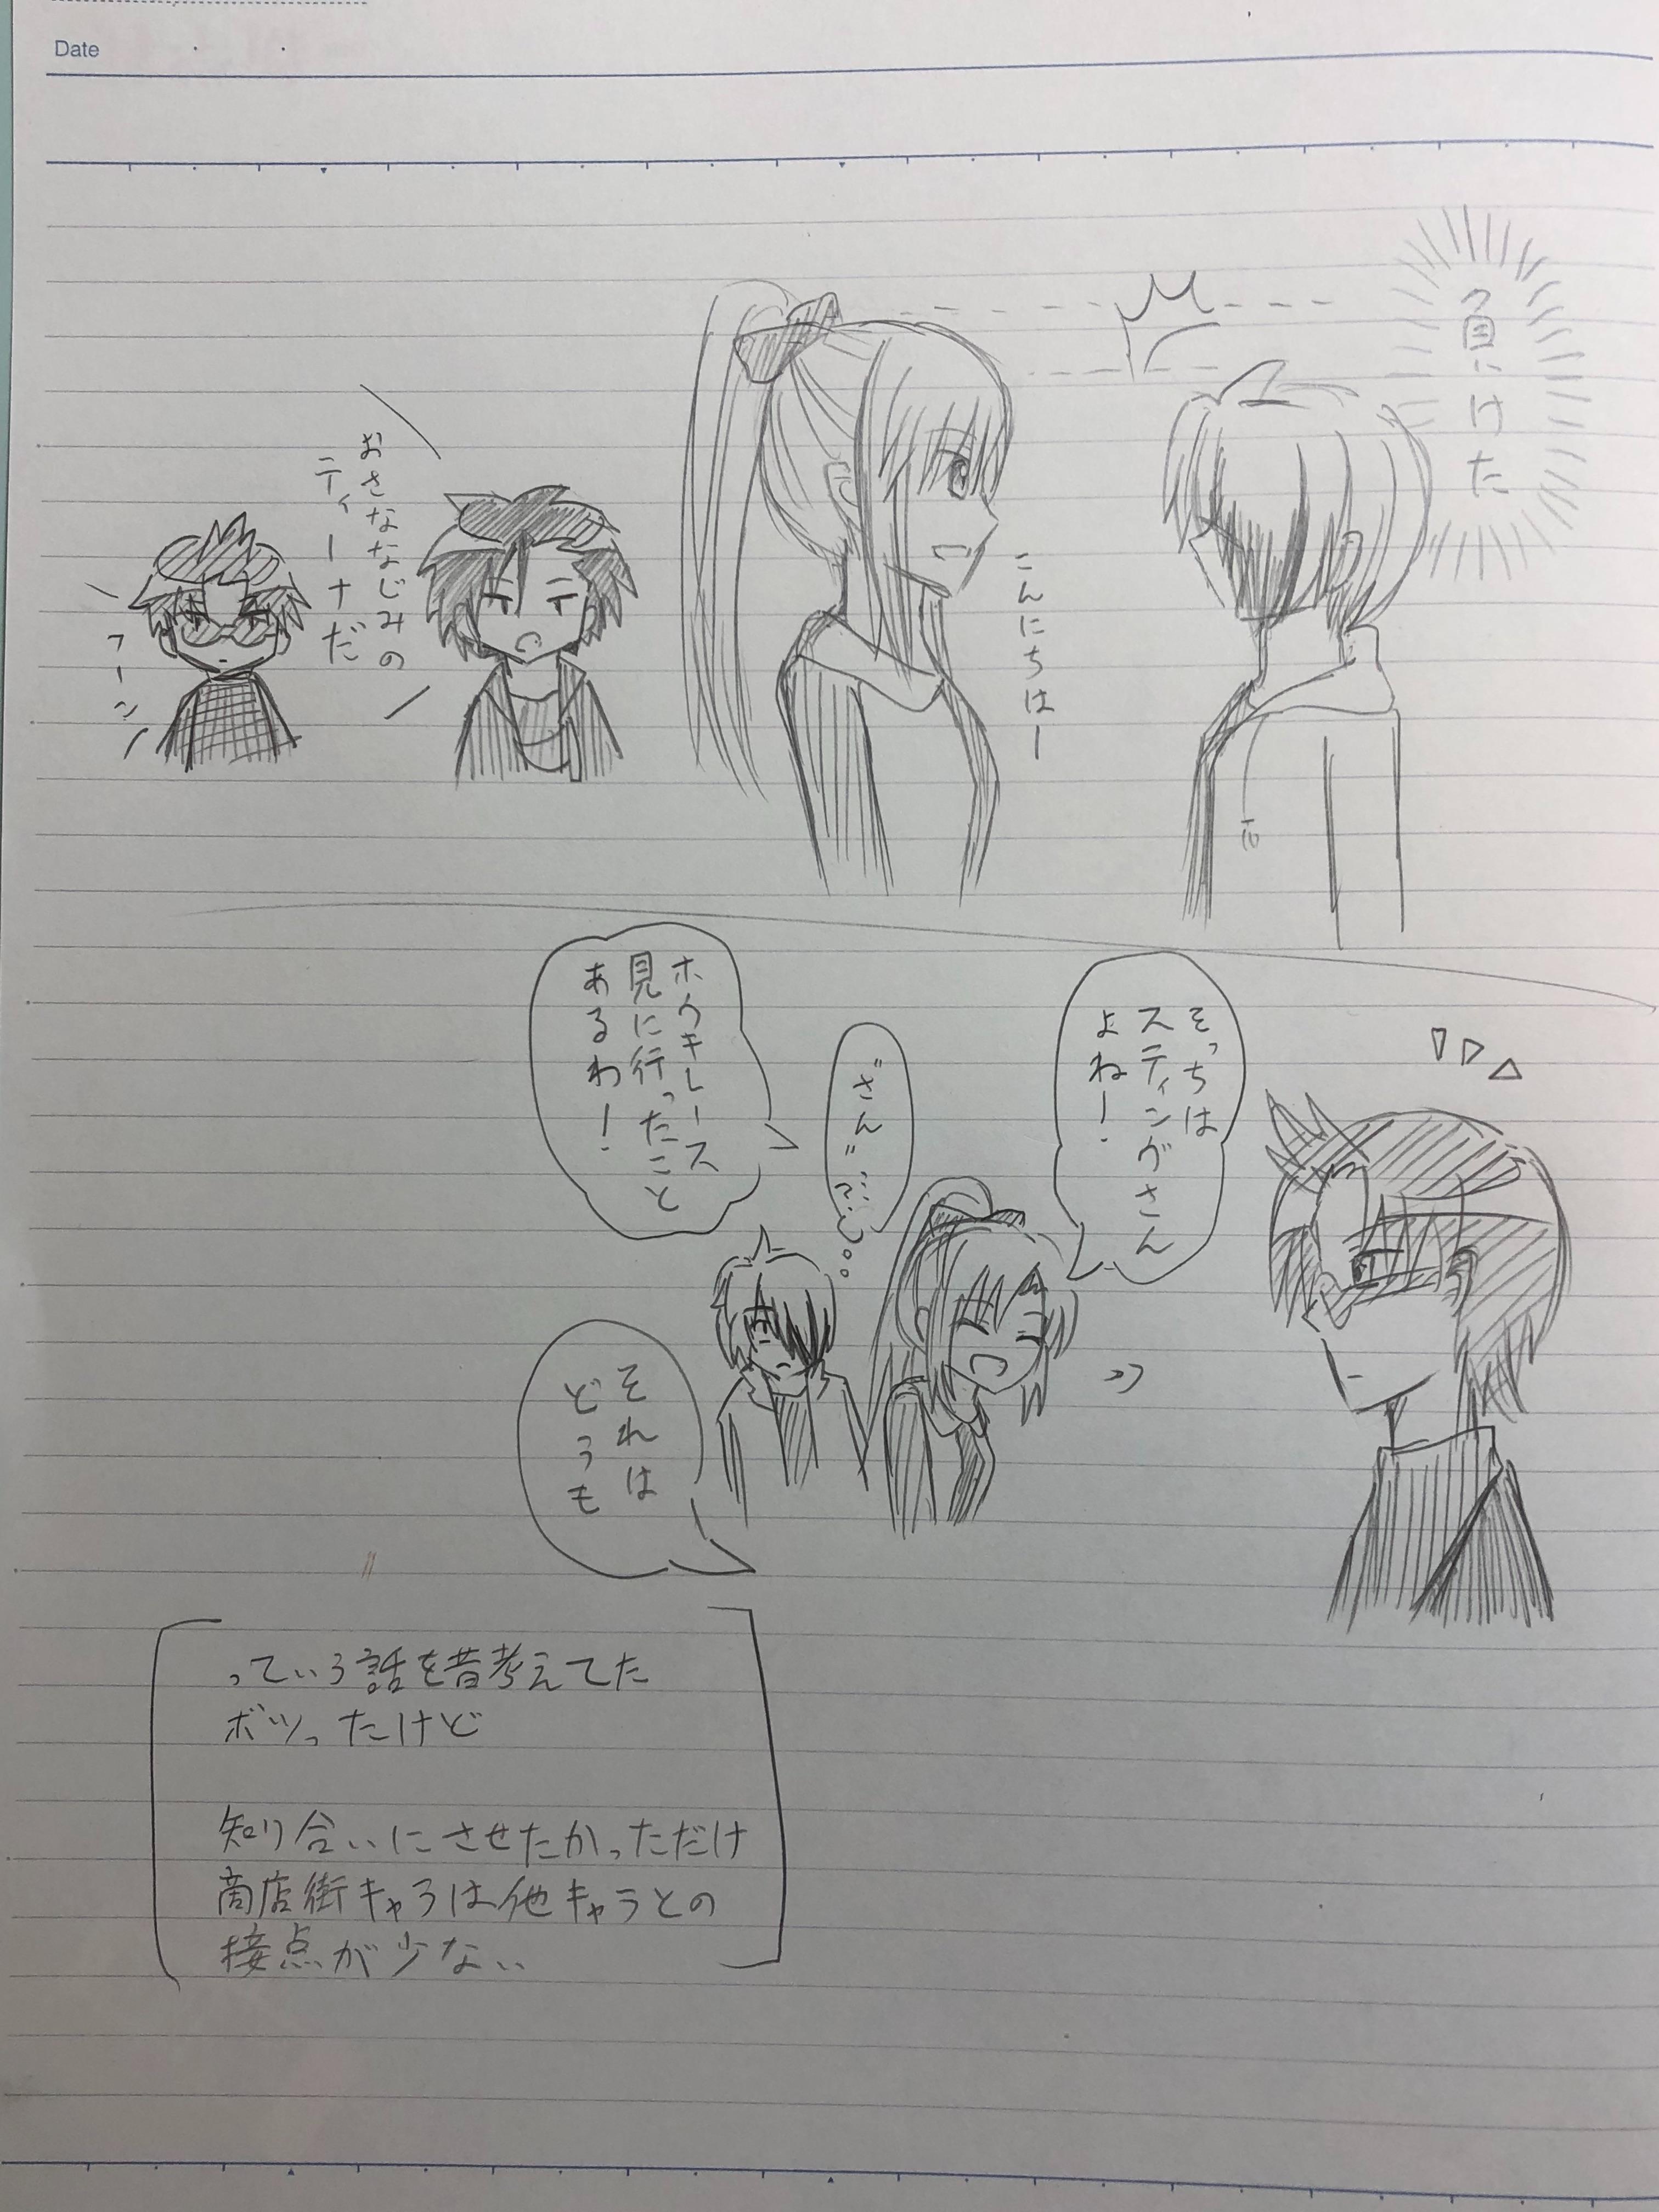 f:id:Yuki-19:20200127153216j:image